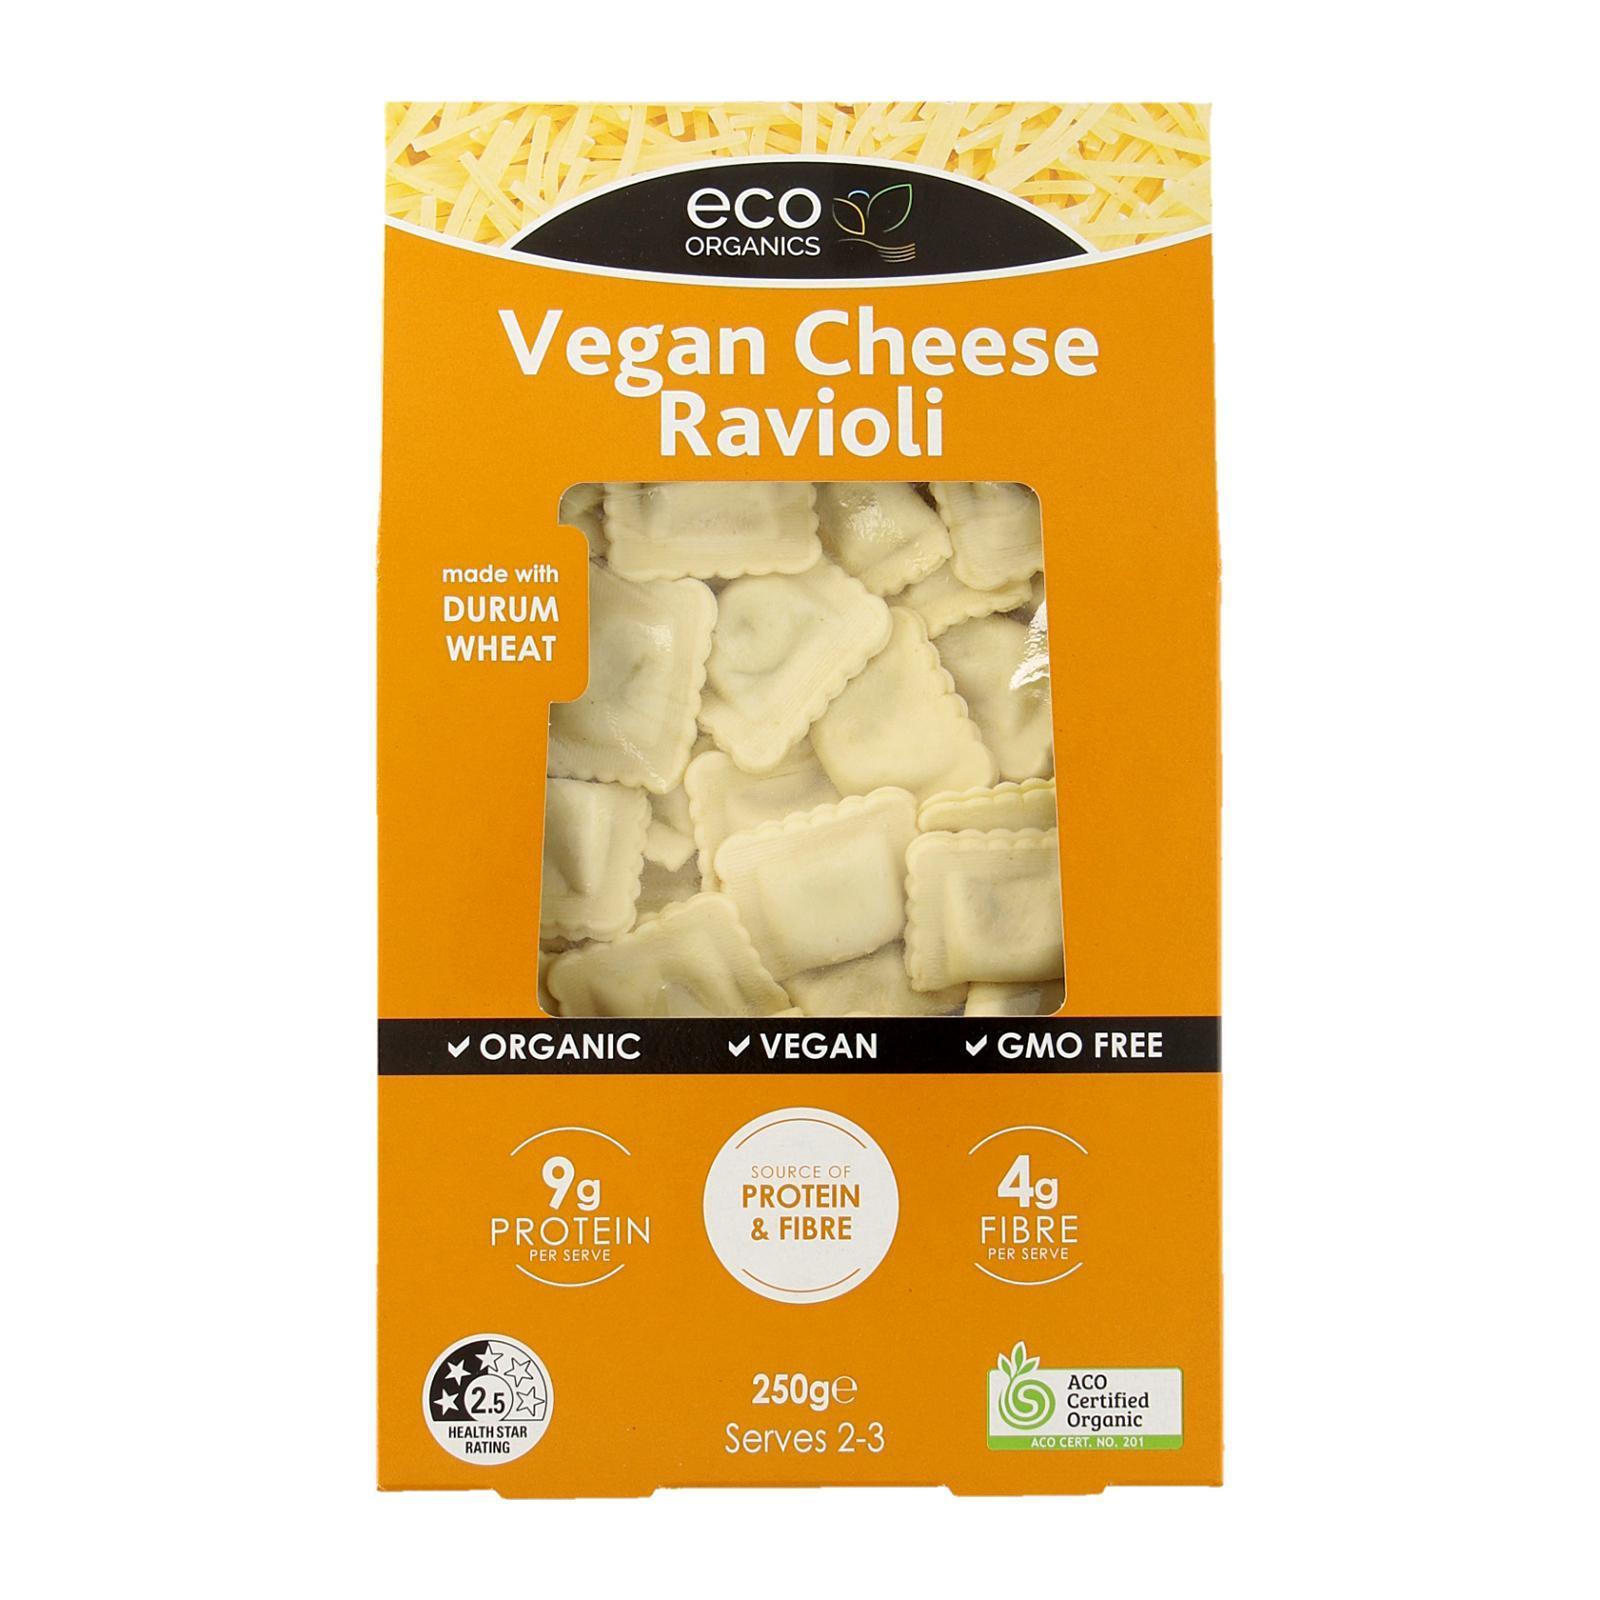 Eco Organics Vegan Cheese Ravioli Pasta - By Wholesome Harvest